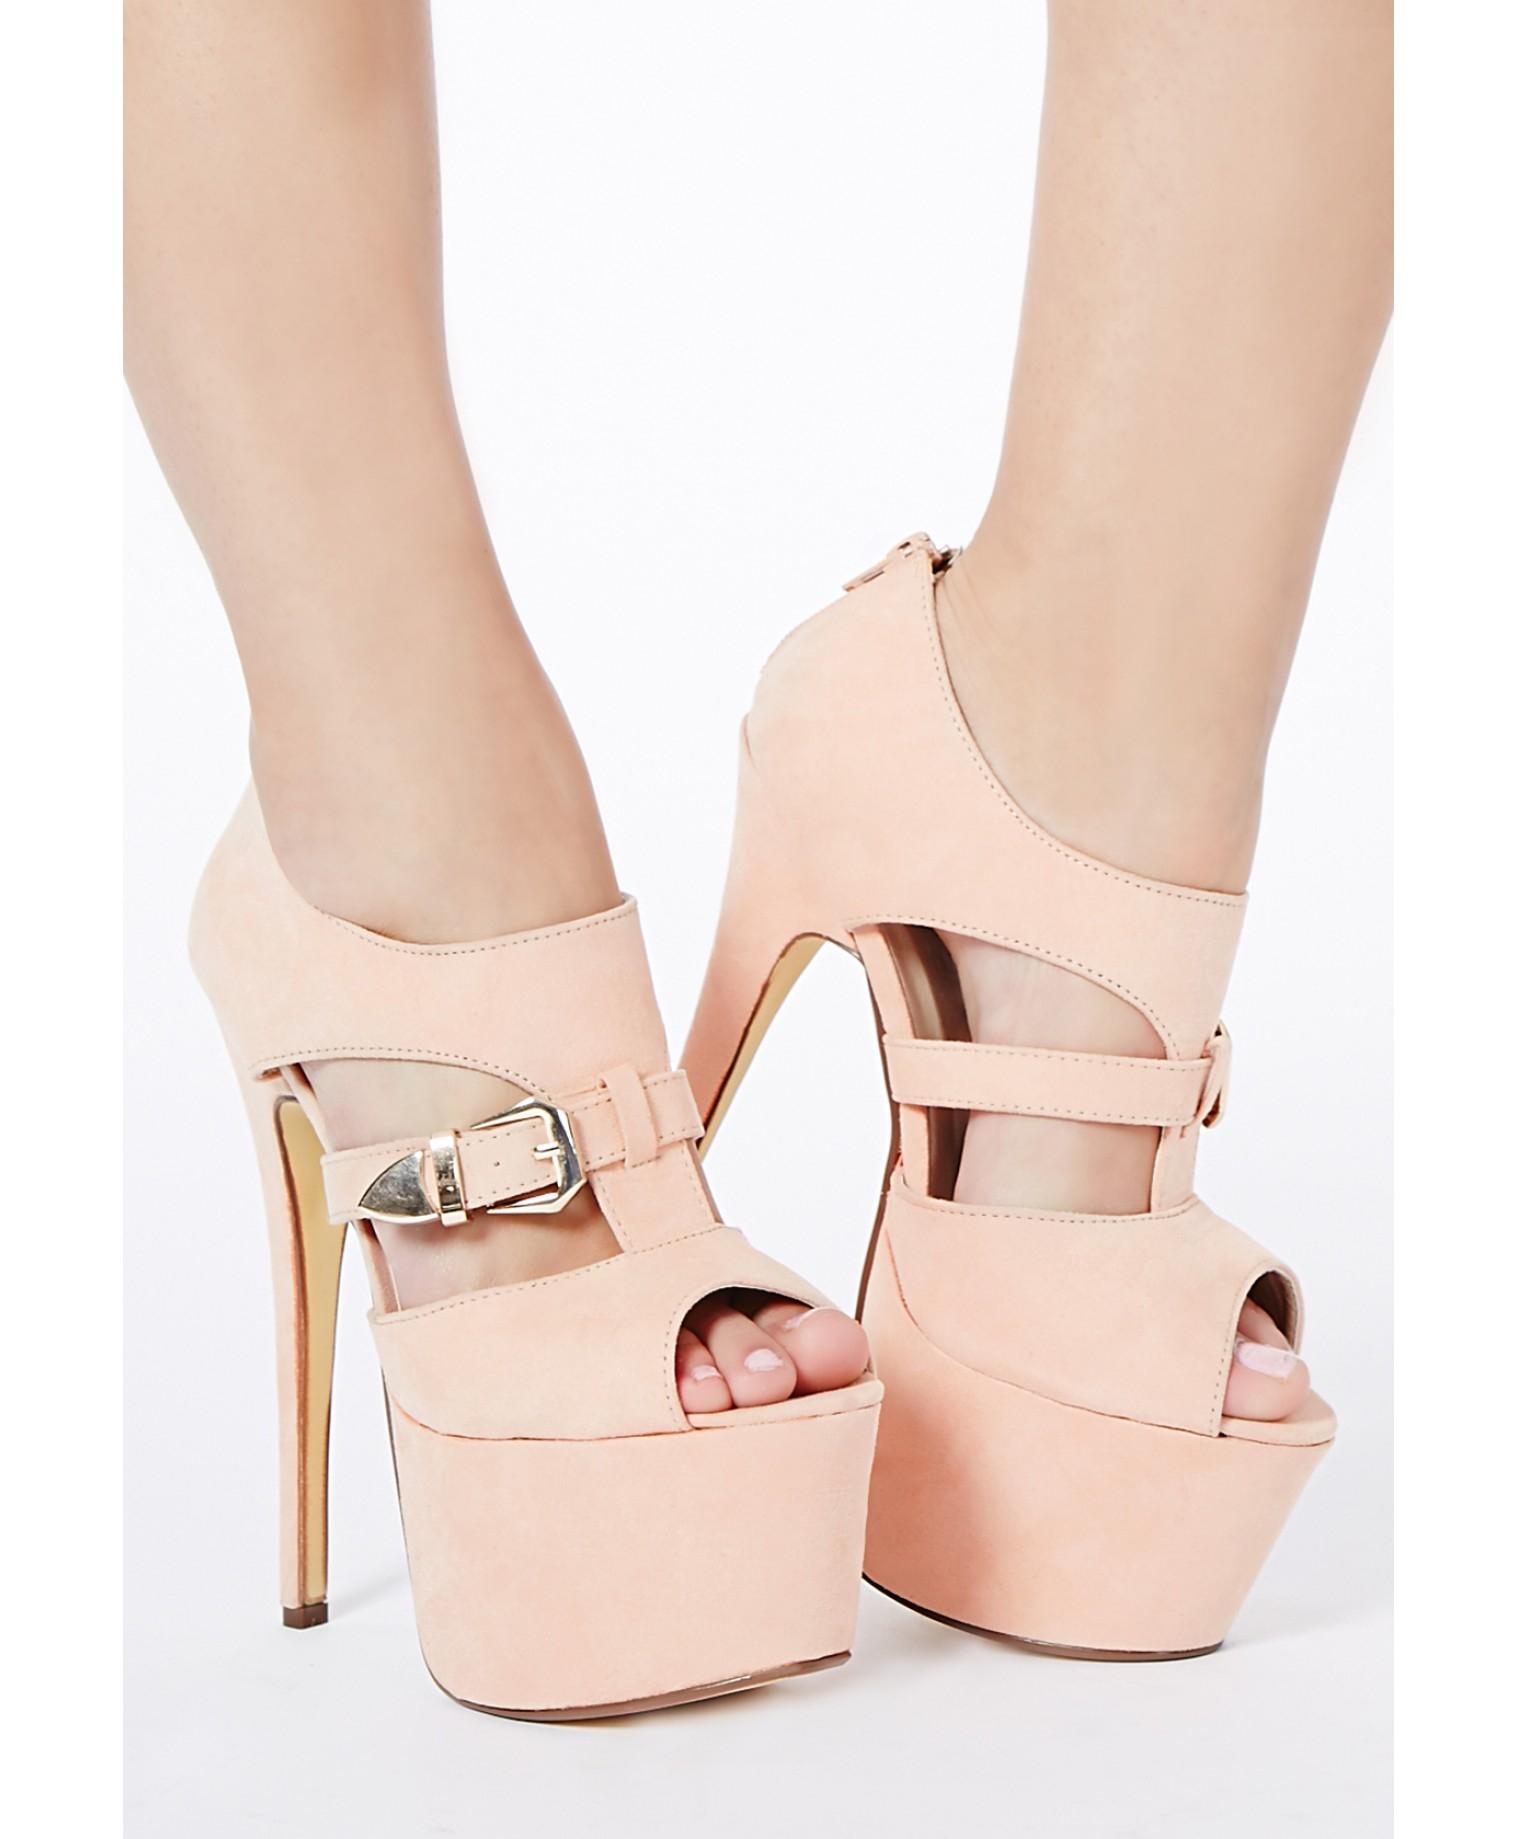 61033590a4d9ec Lyst - Missguided Connie Blush Peep Toe Platform Heels in Pink